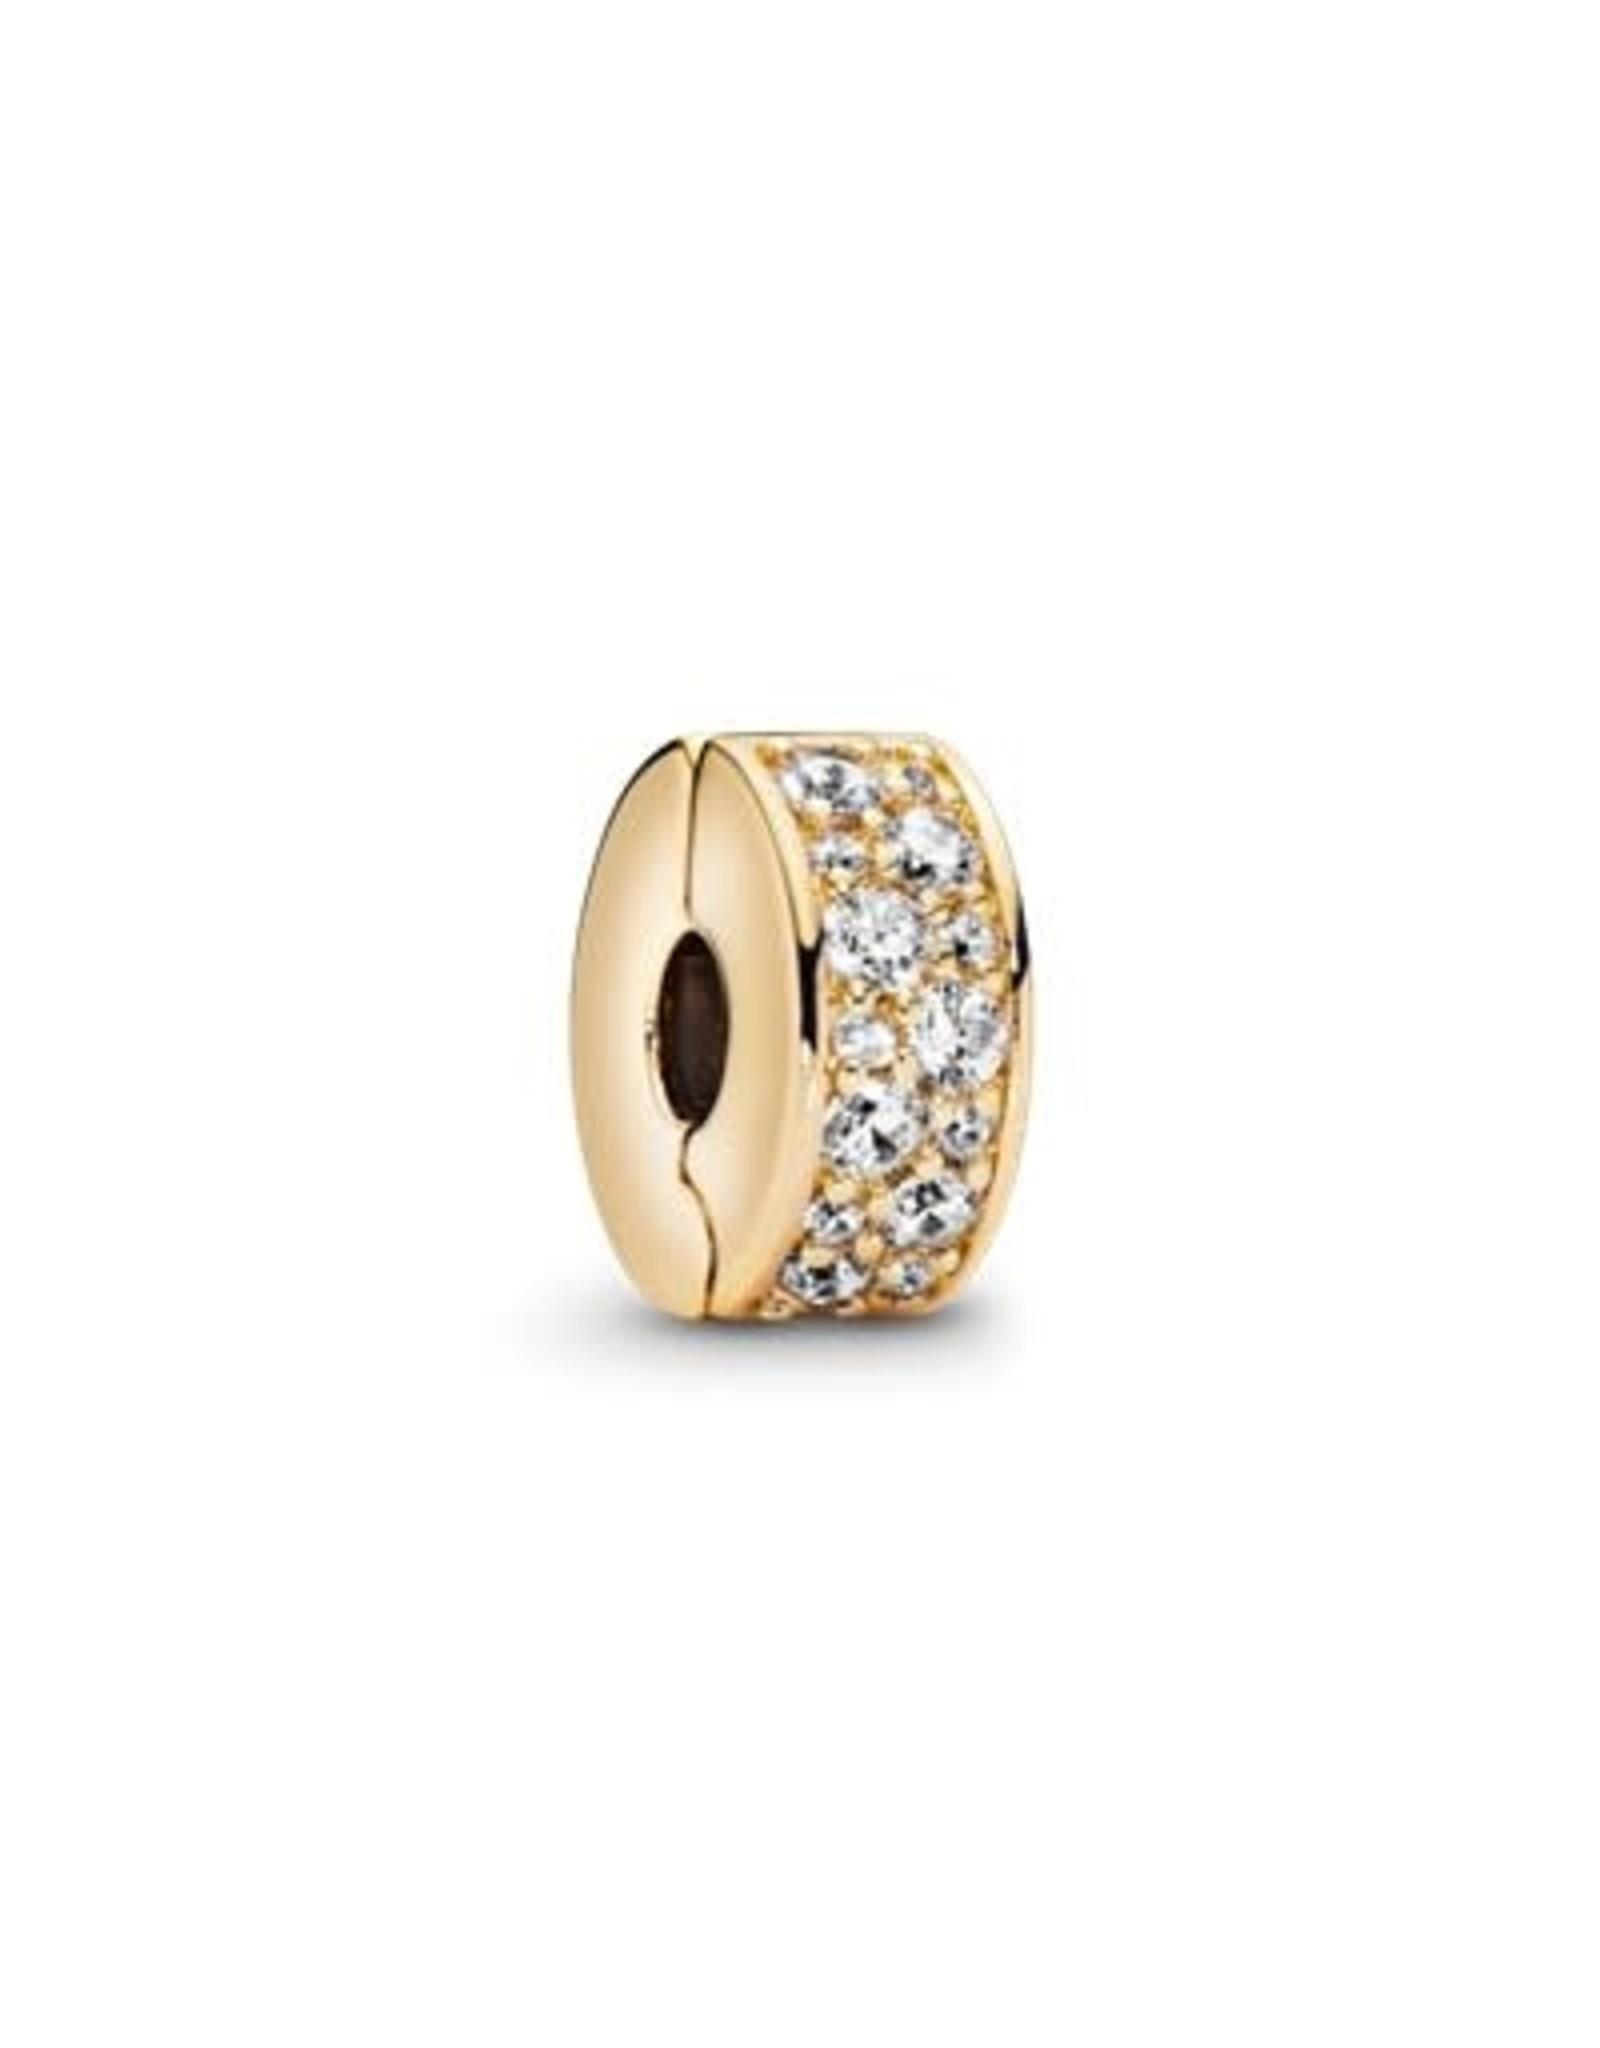 Pandora Pandora Shine Clip, Shining Elegance, Clear CZ